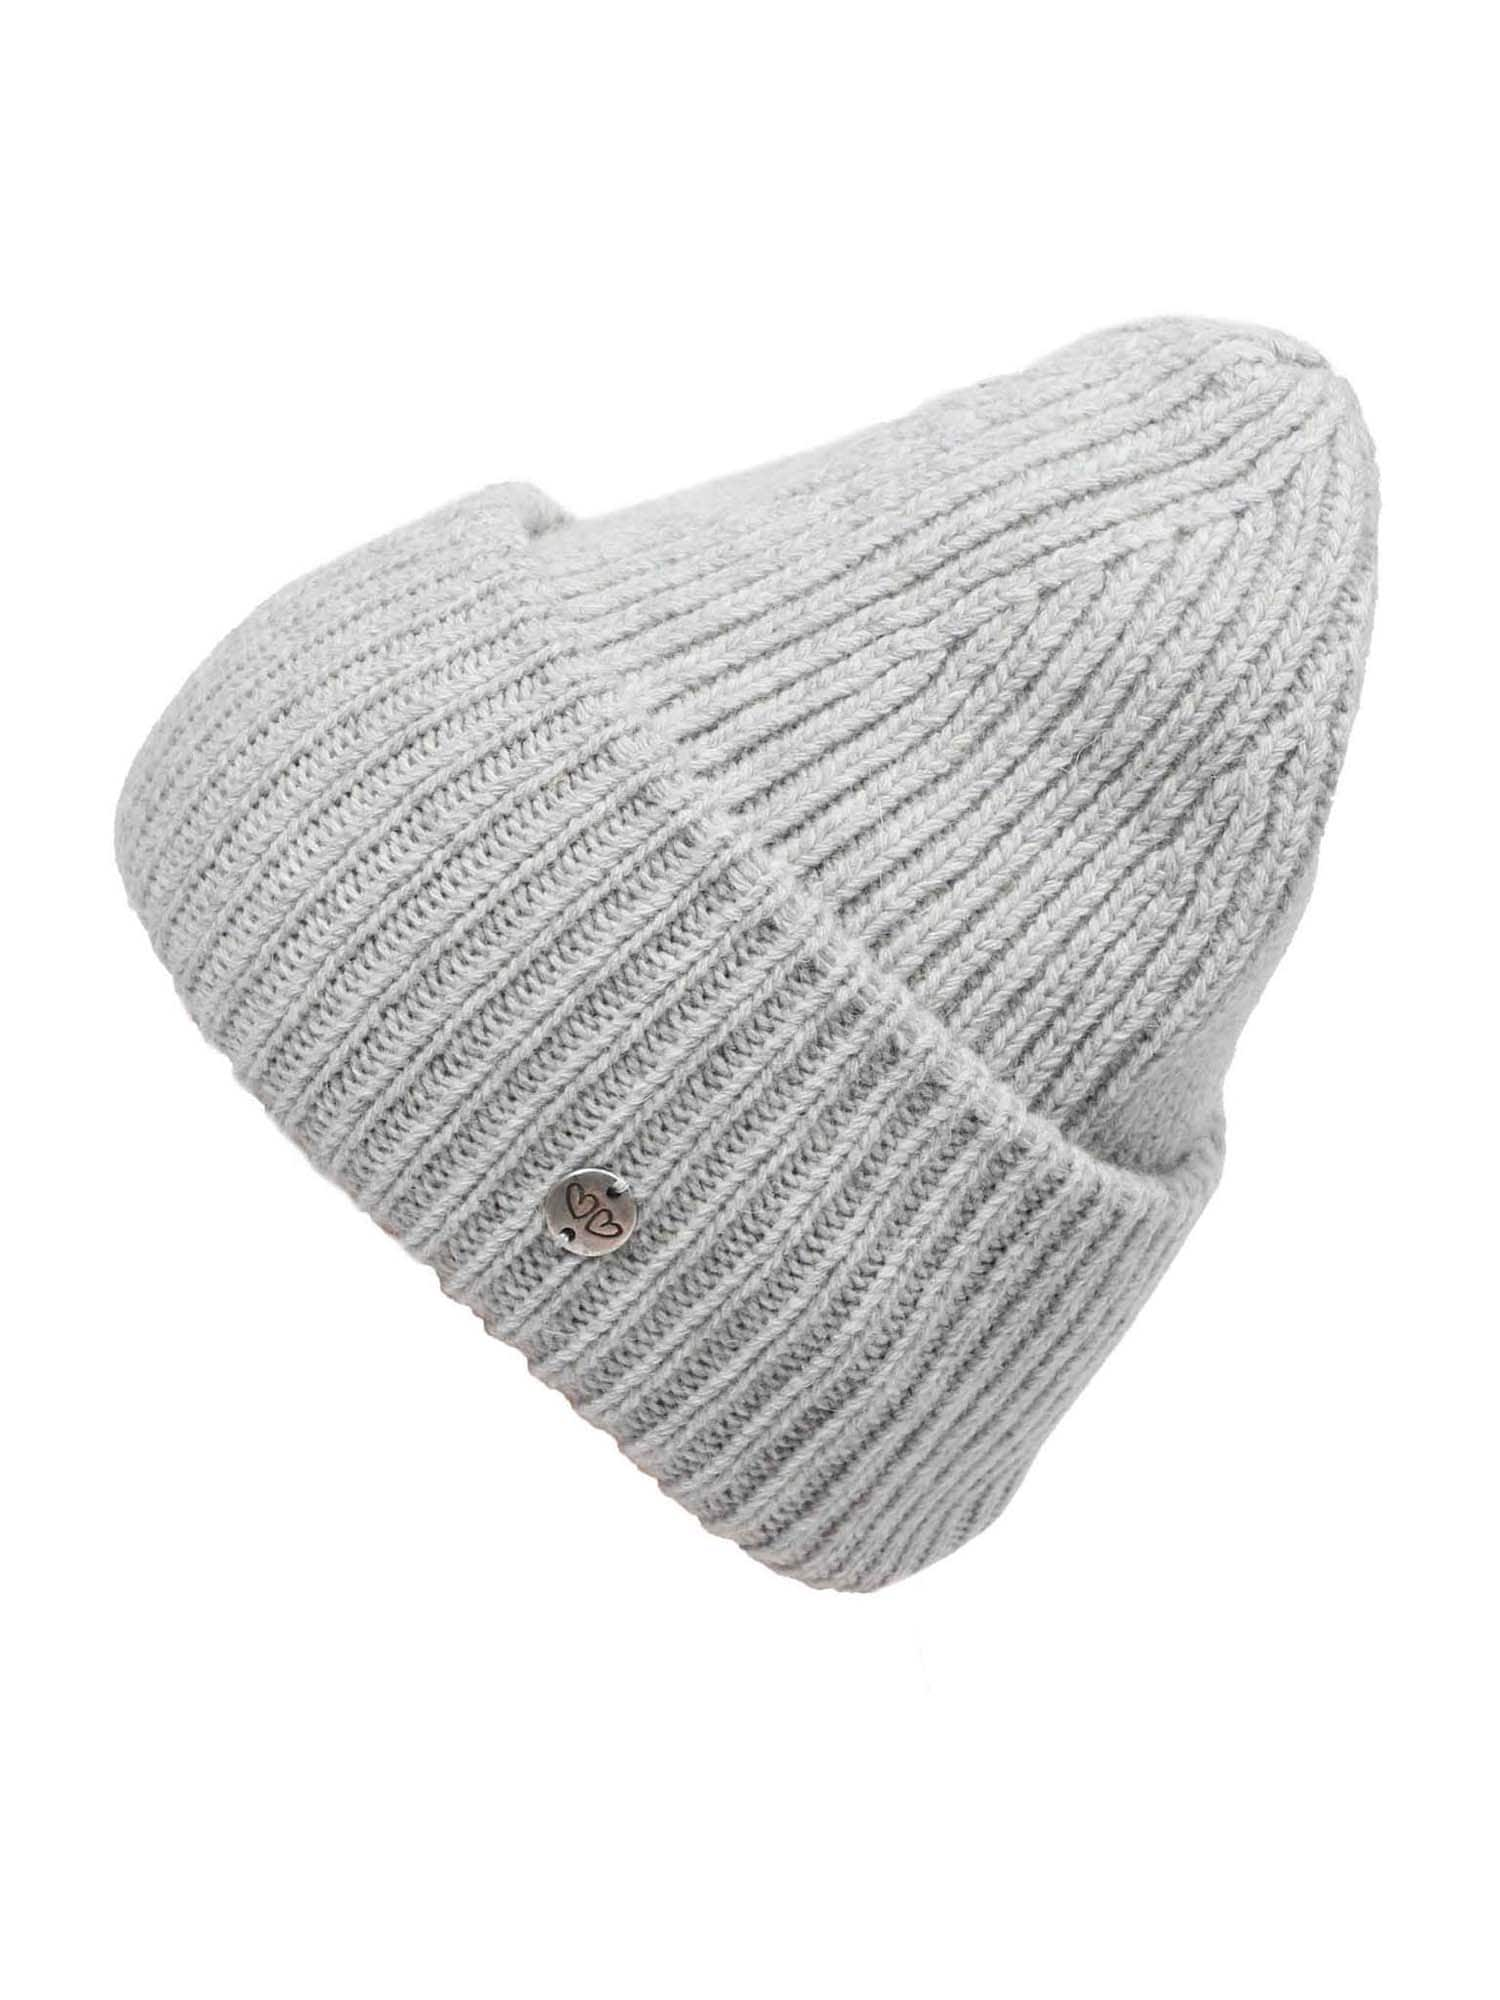 Zwillingsherz Megzta kepurė šviesiai pilka